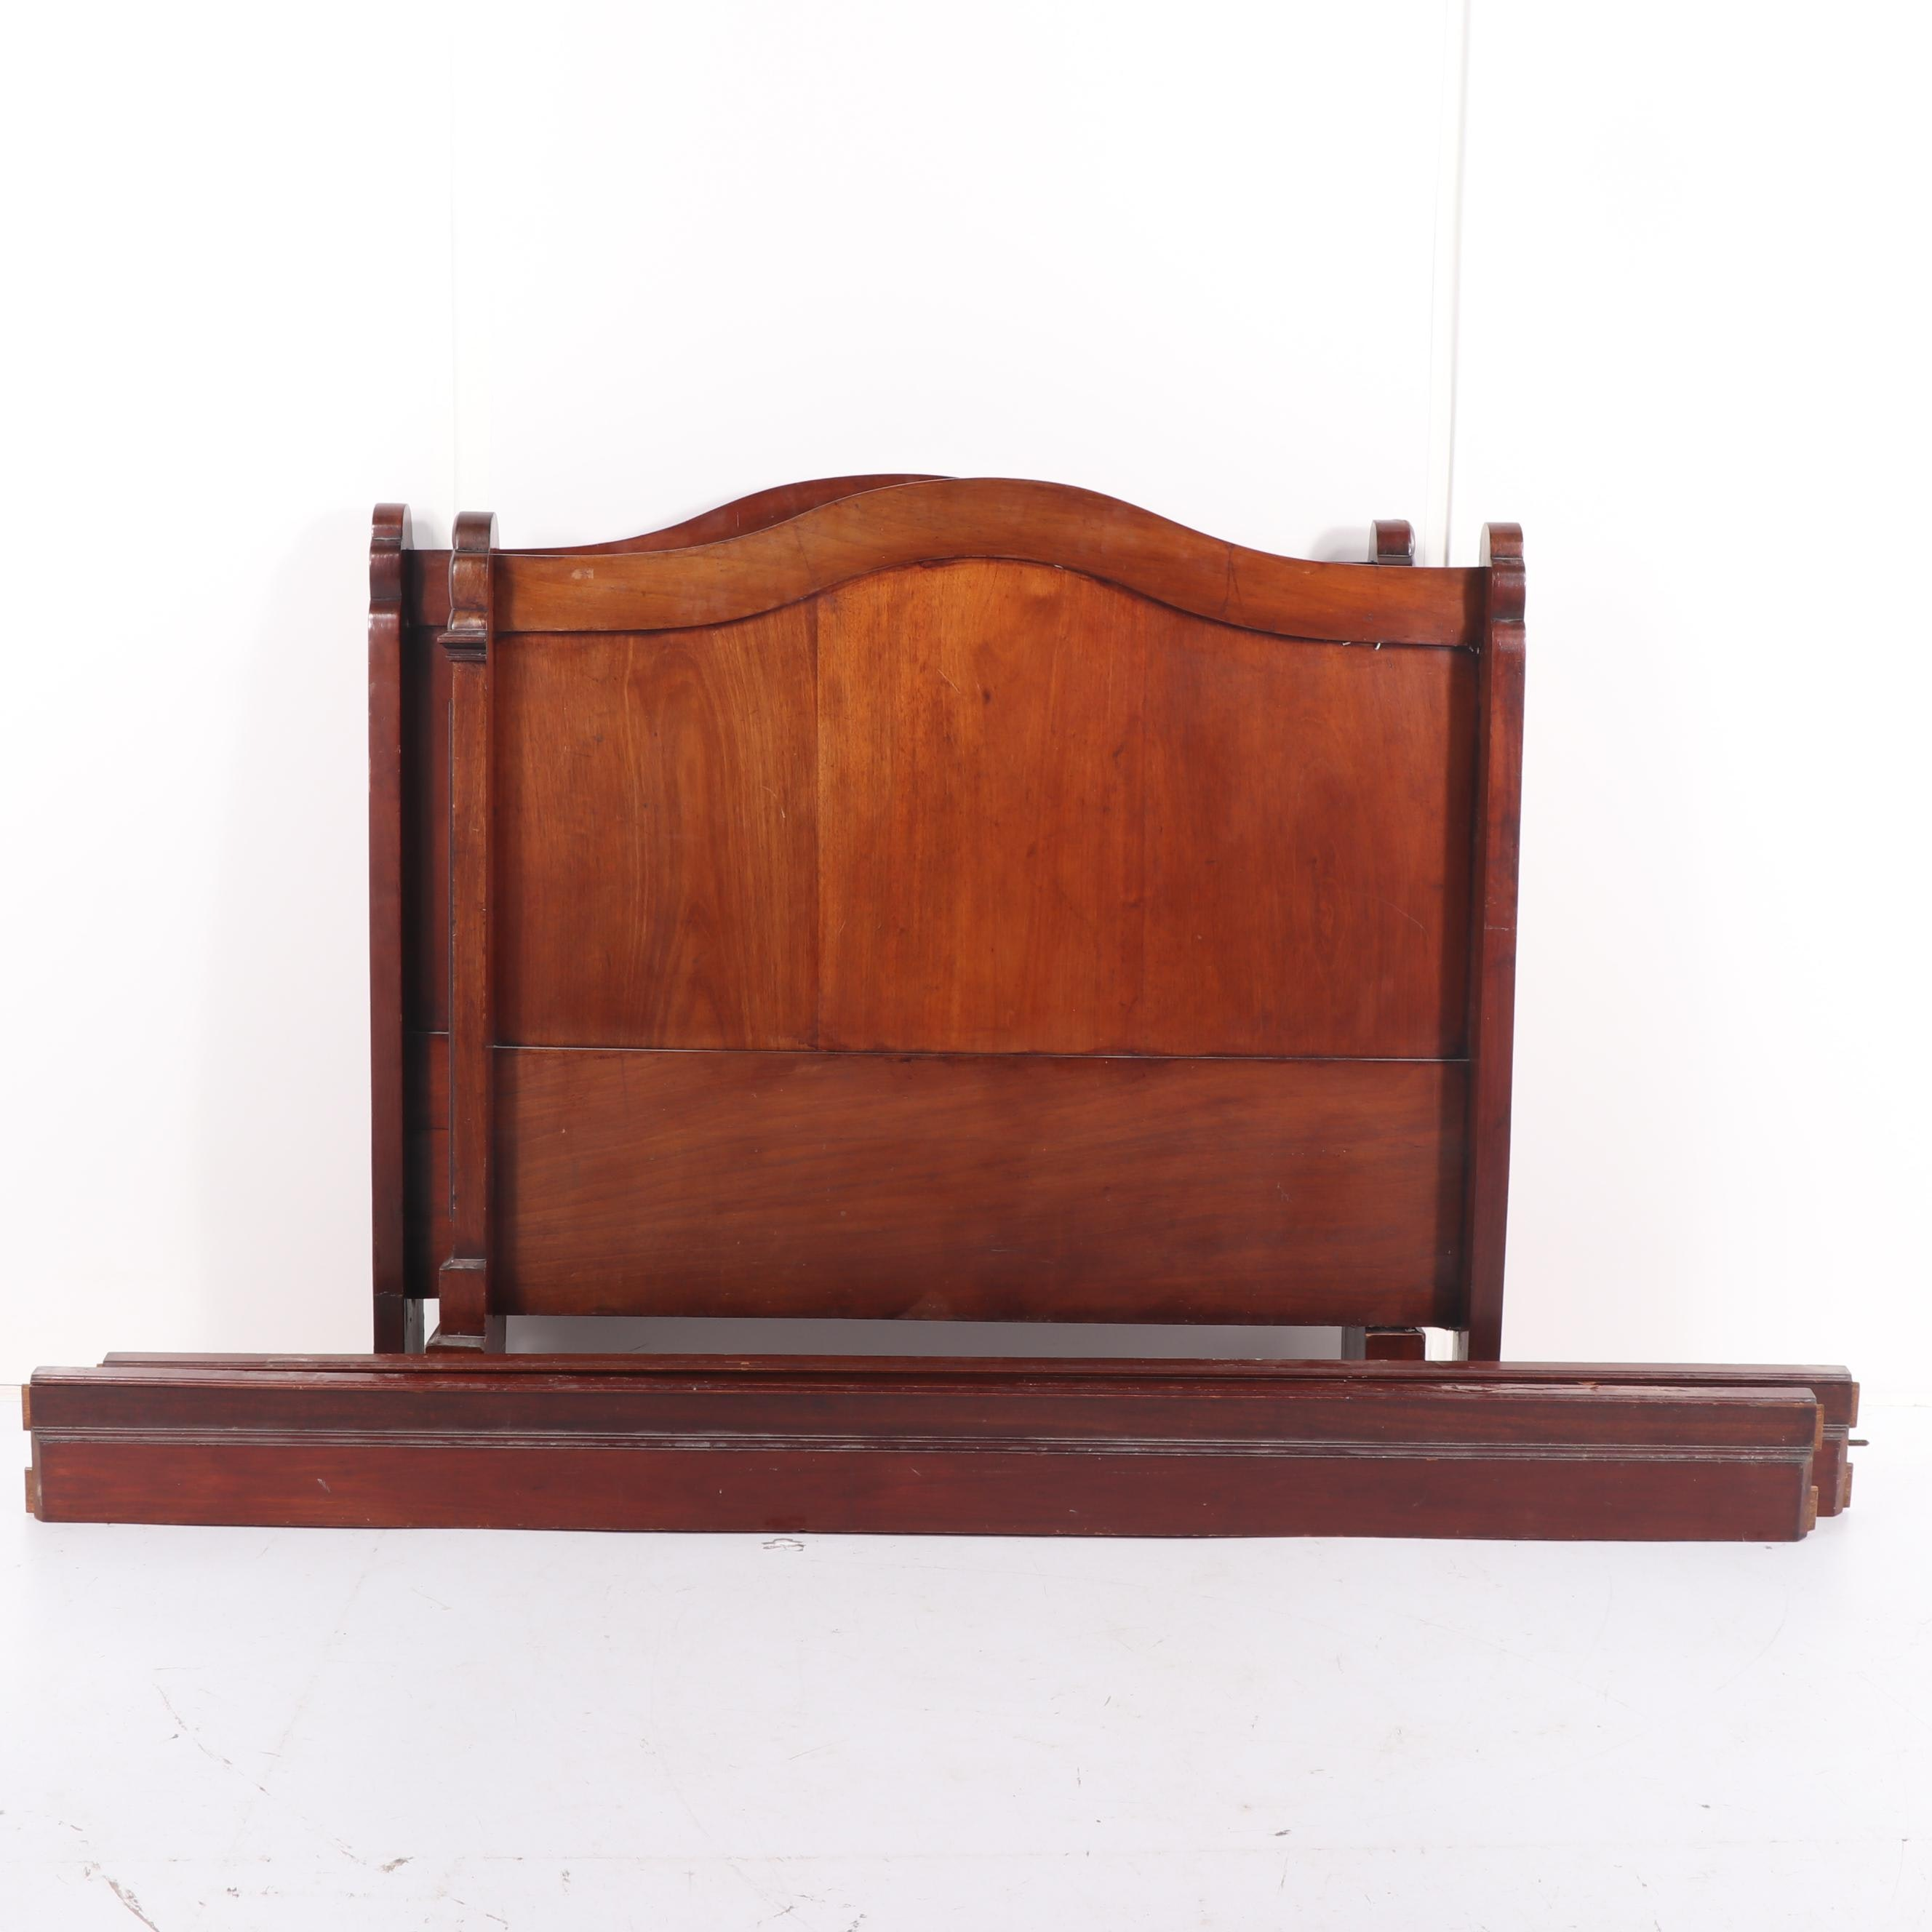 Renaissance Revival Style Mahogany Full Size Bed Frame, Mid 20th Century